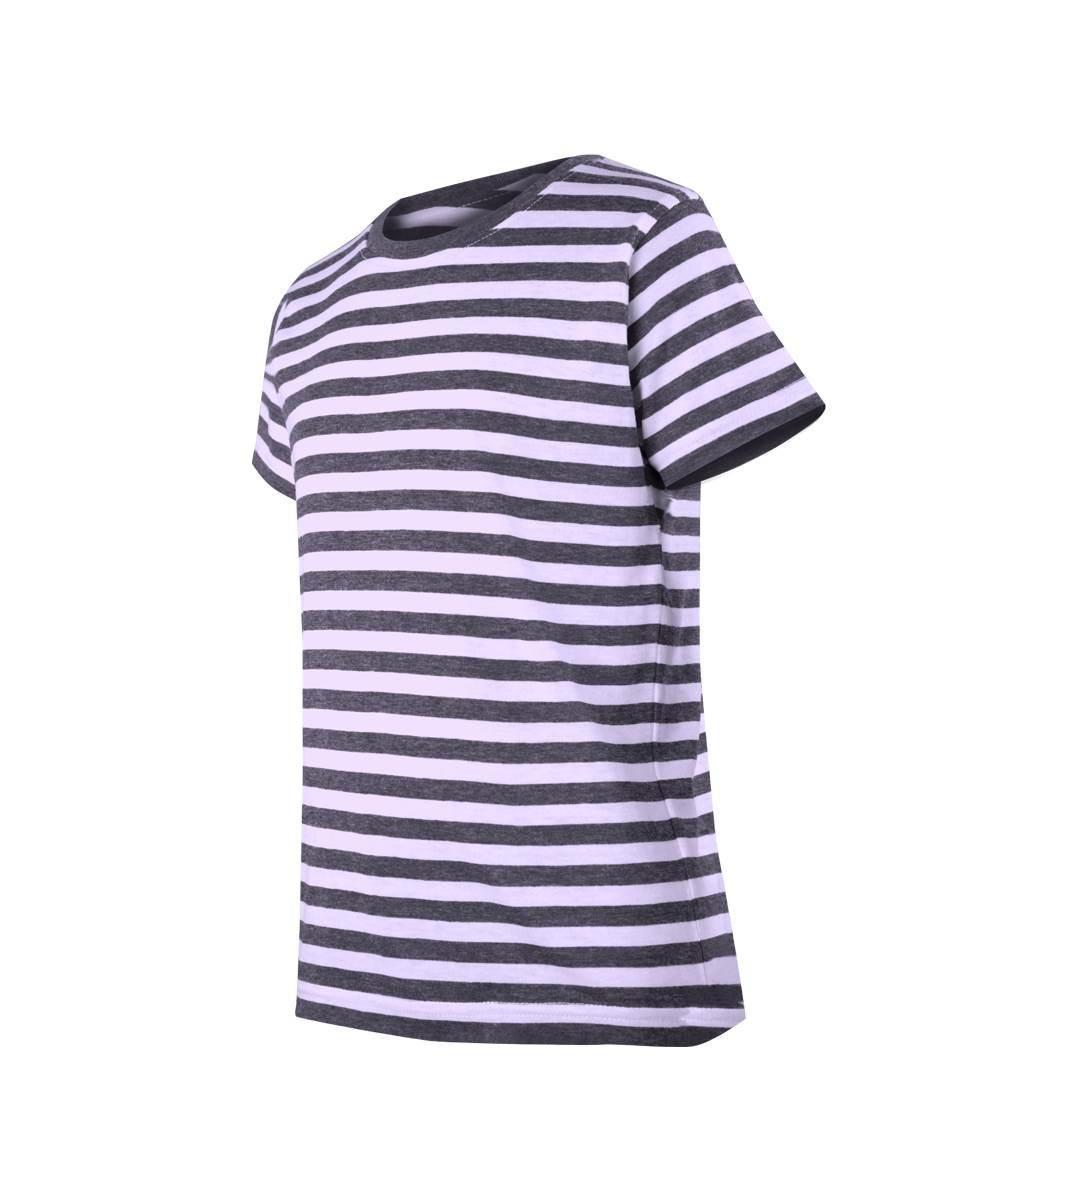 01d129e78fd9 Detské námornícke tričko